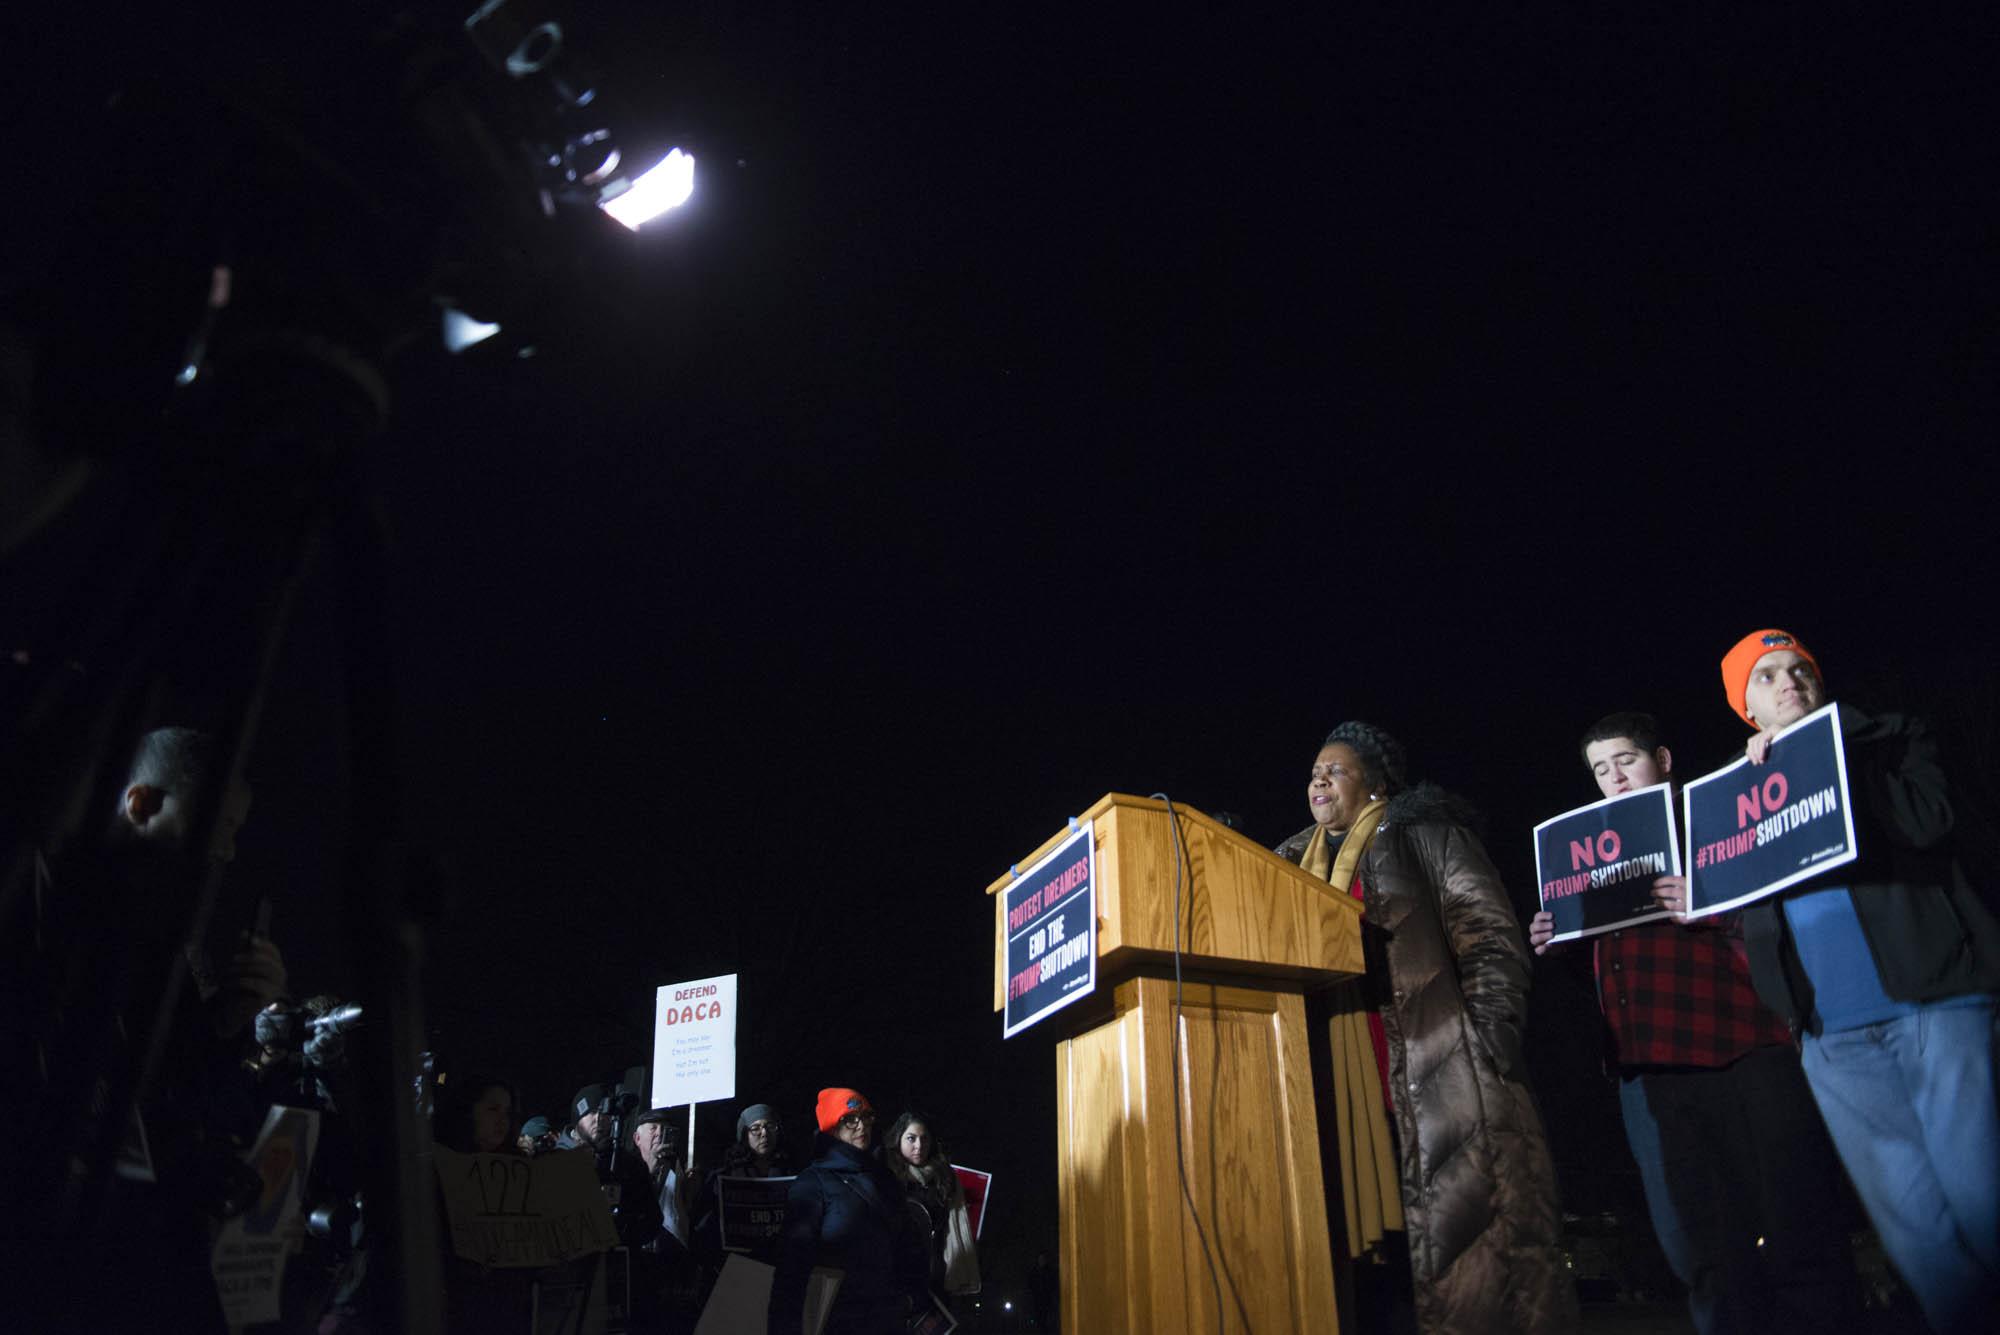 Congresswoman Sheila Jackson Lee of Texas